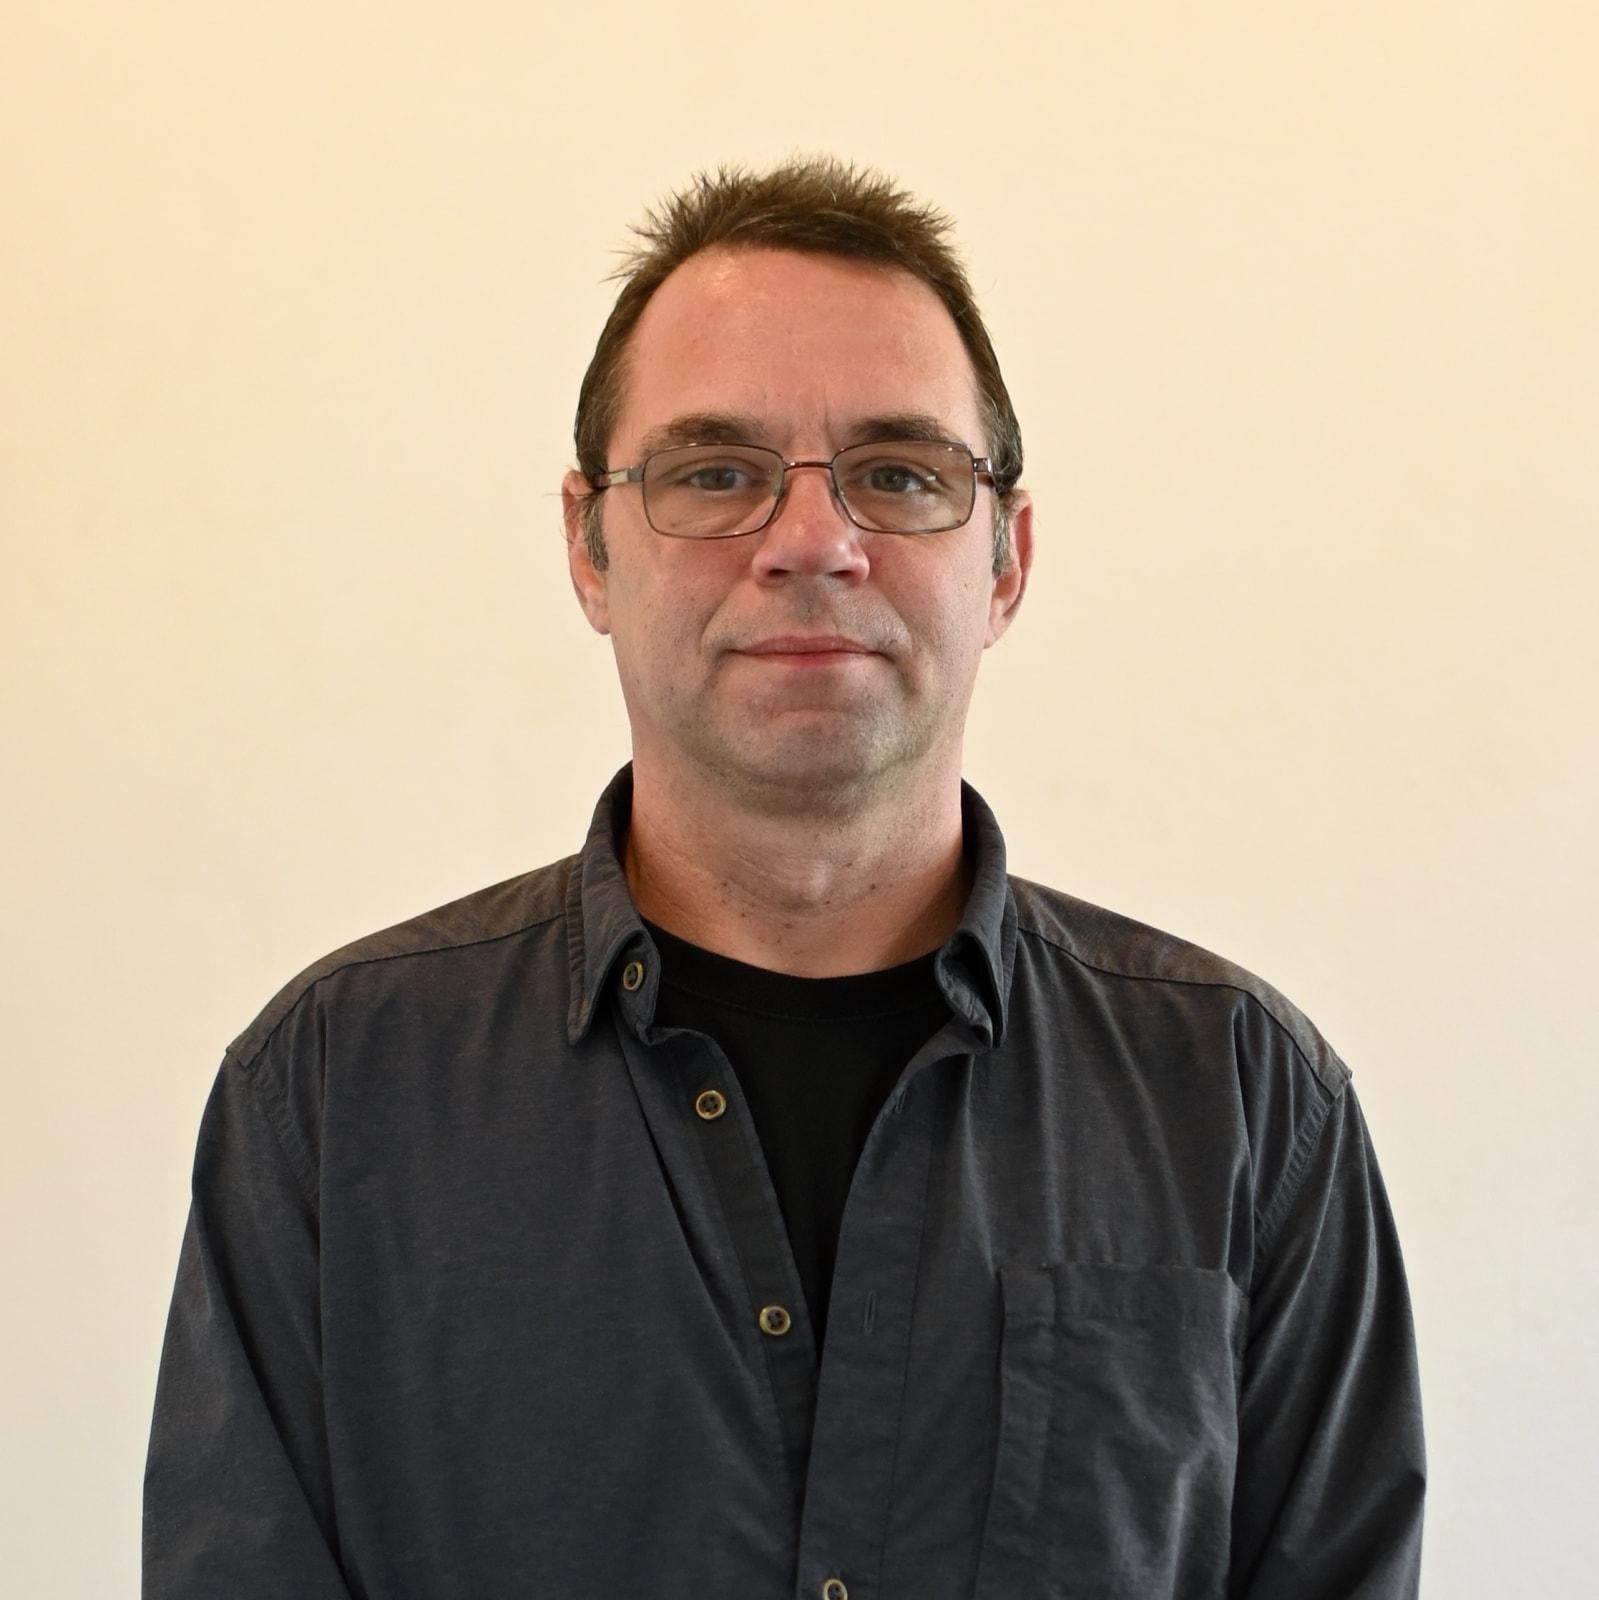 Jeff Lorince Preparator, Installer